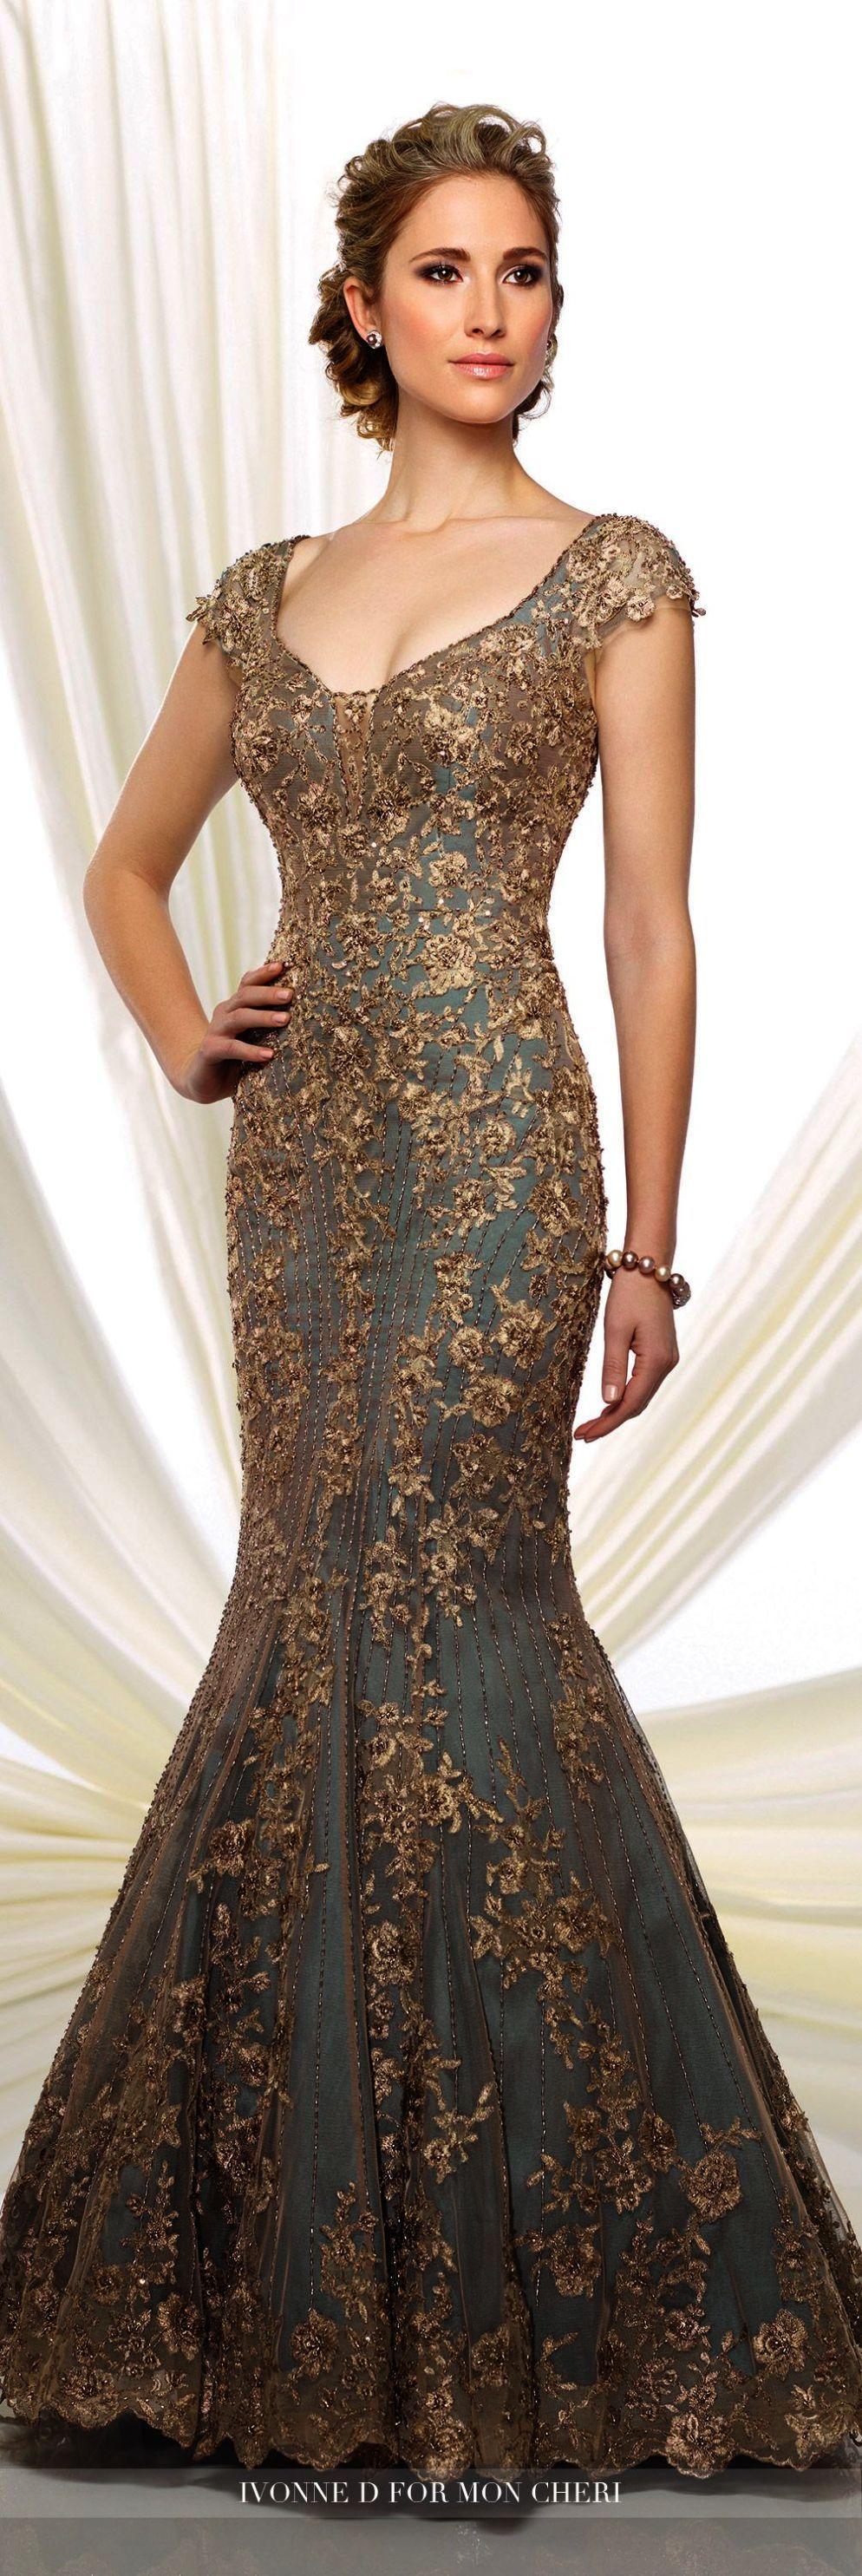 Formal Dress Ebay Ball Gown Indian Dresses Evening Gowns Formal Gorgeous Prom Dresses Evening Gowns